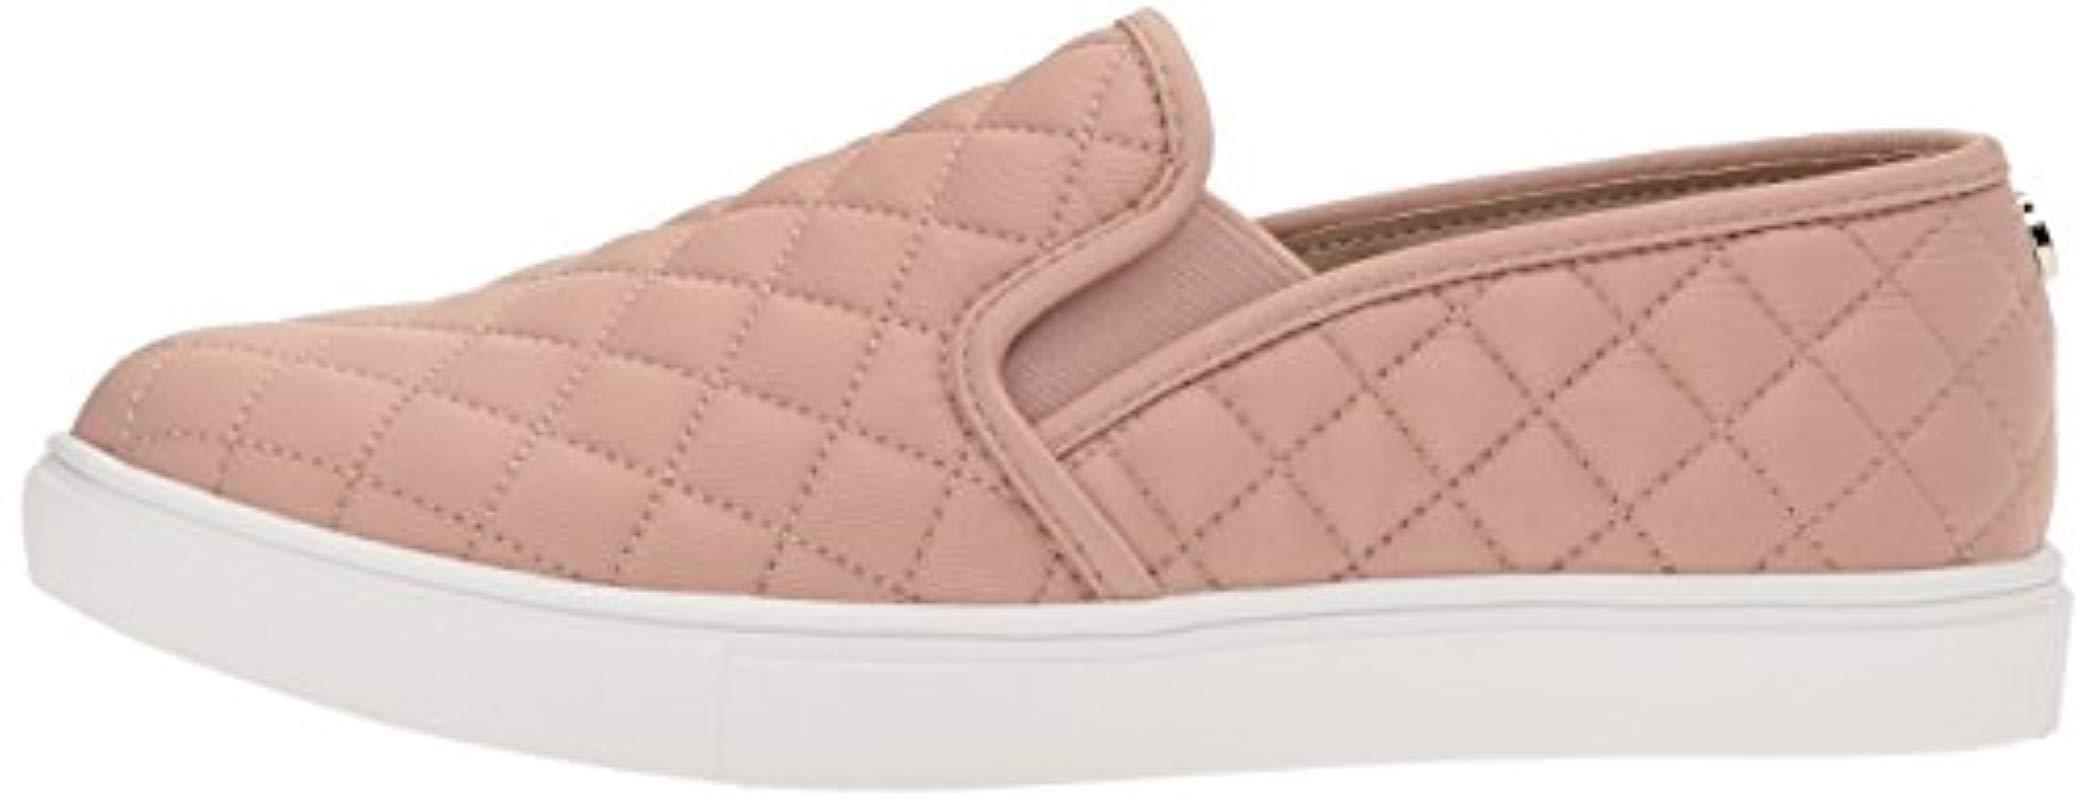 Steve Madden Leather Ecentrcq Sneaker